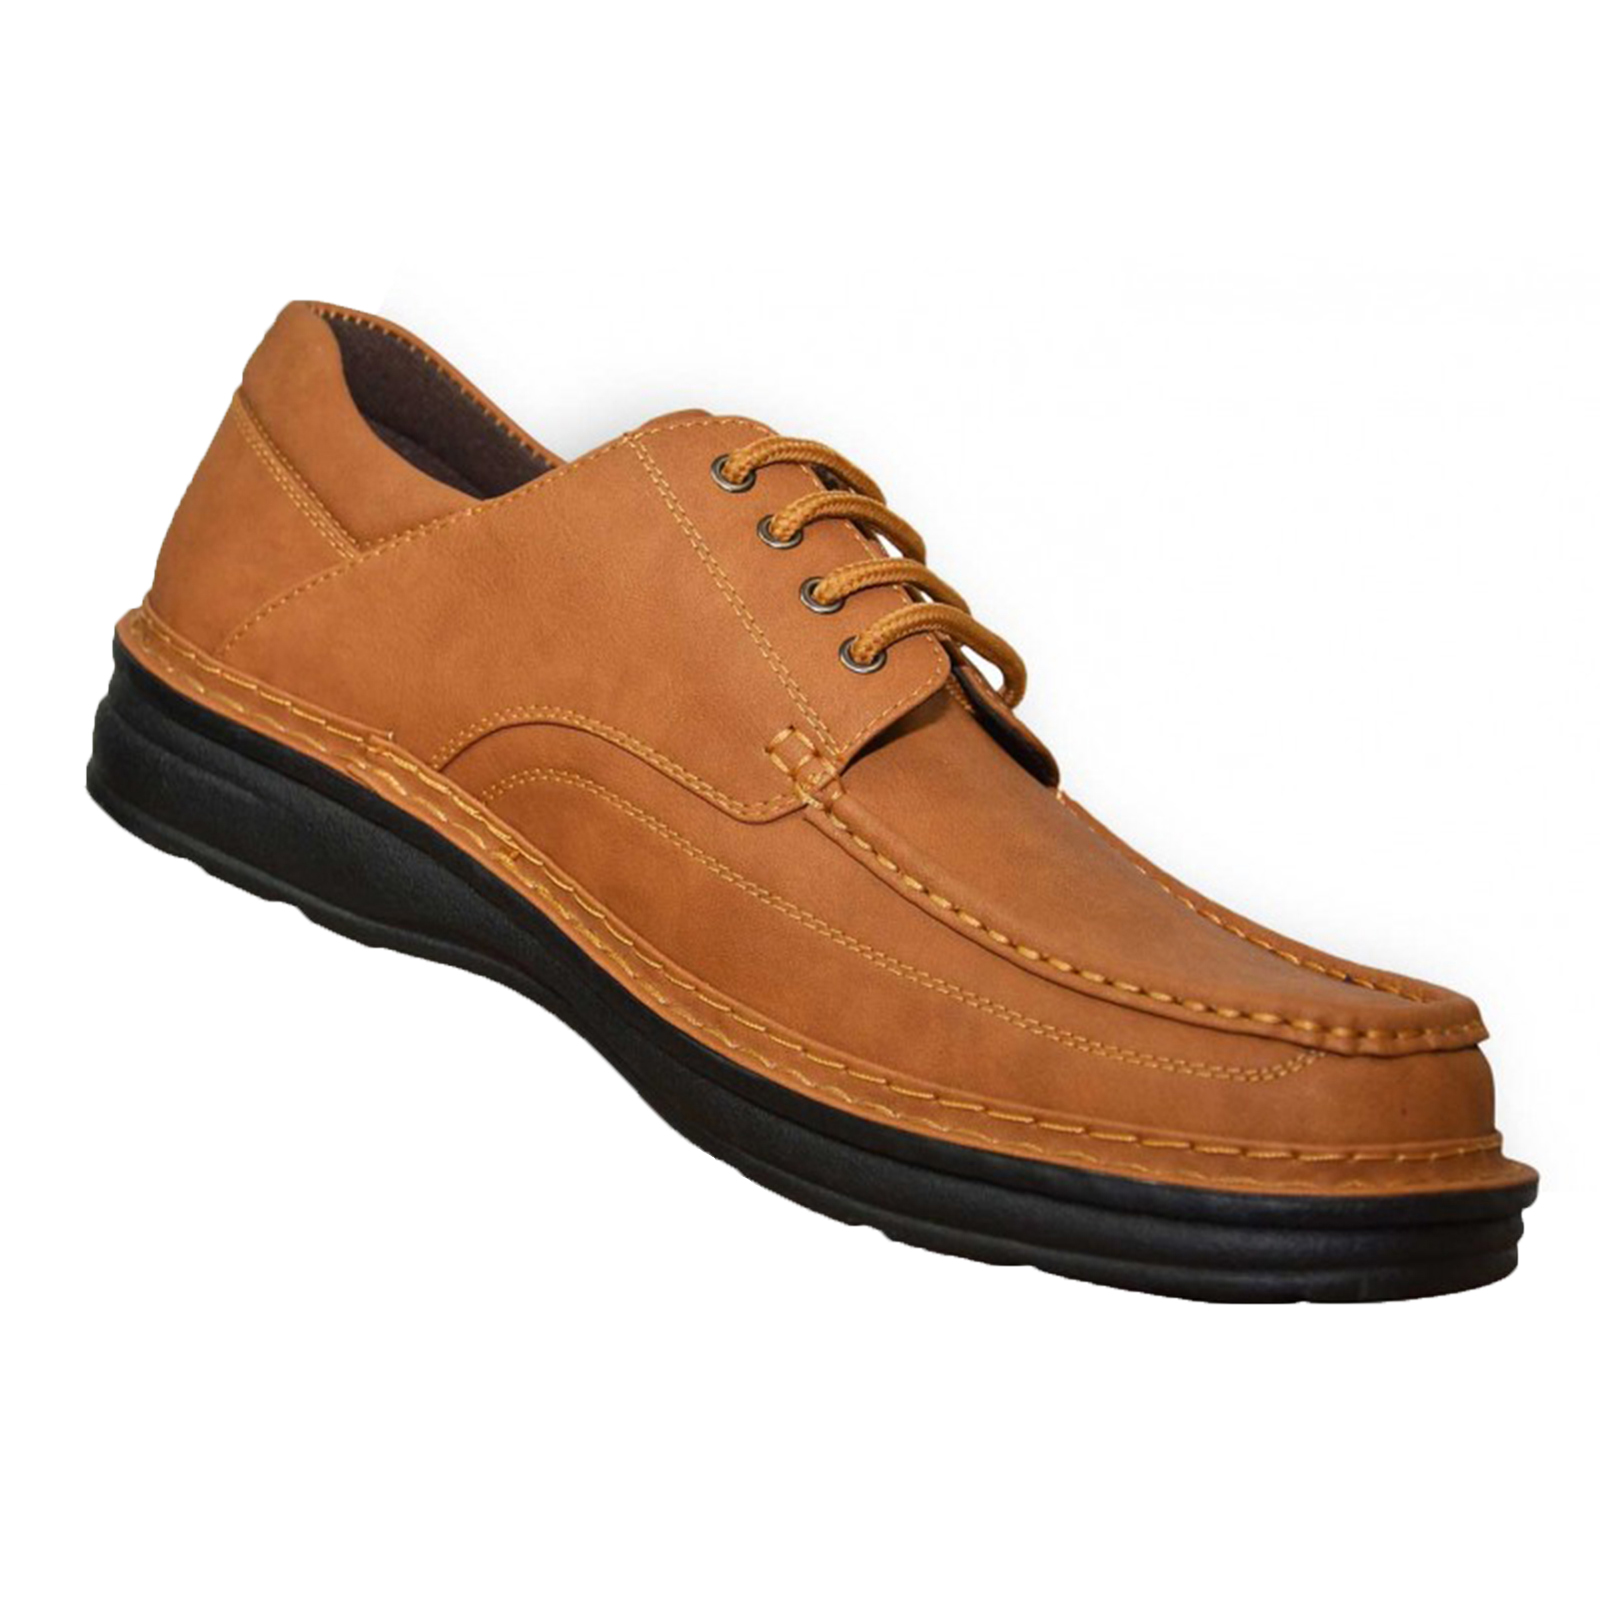 Duke-D555-Keanu-para-hombre-Big-King-Size-Zapatos-Con-Cordones-Calzado-de-Disenador-de-Cuero-PU miniatura 6